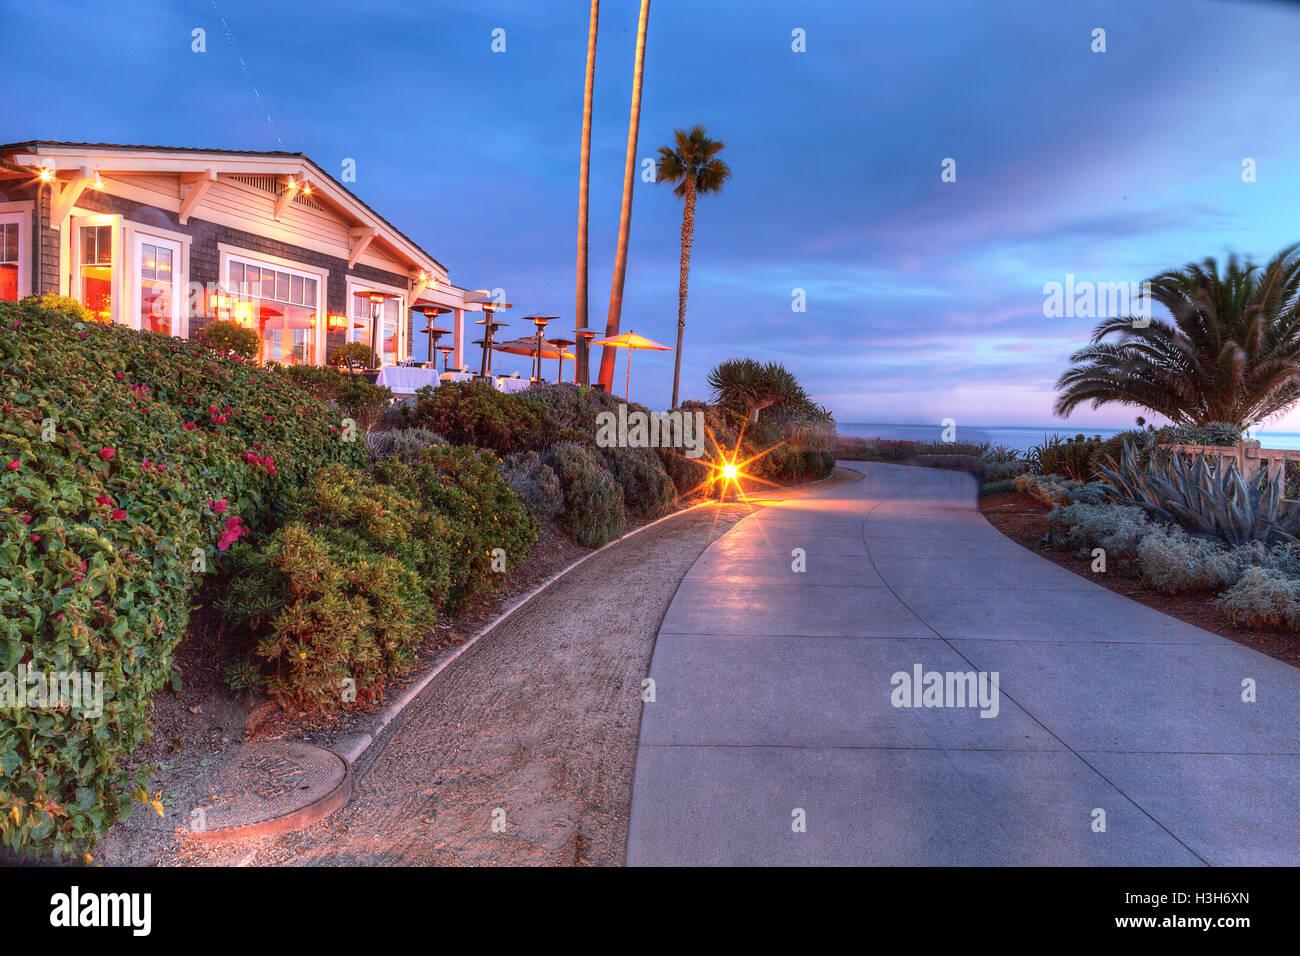 Laguna Beach Ca Usa October 7 2016 Sunset View Of